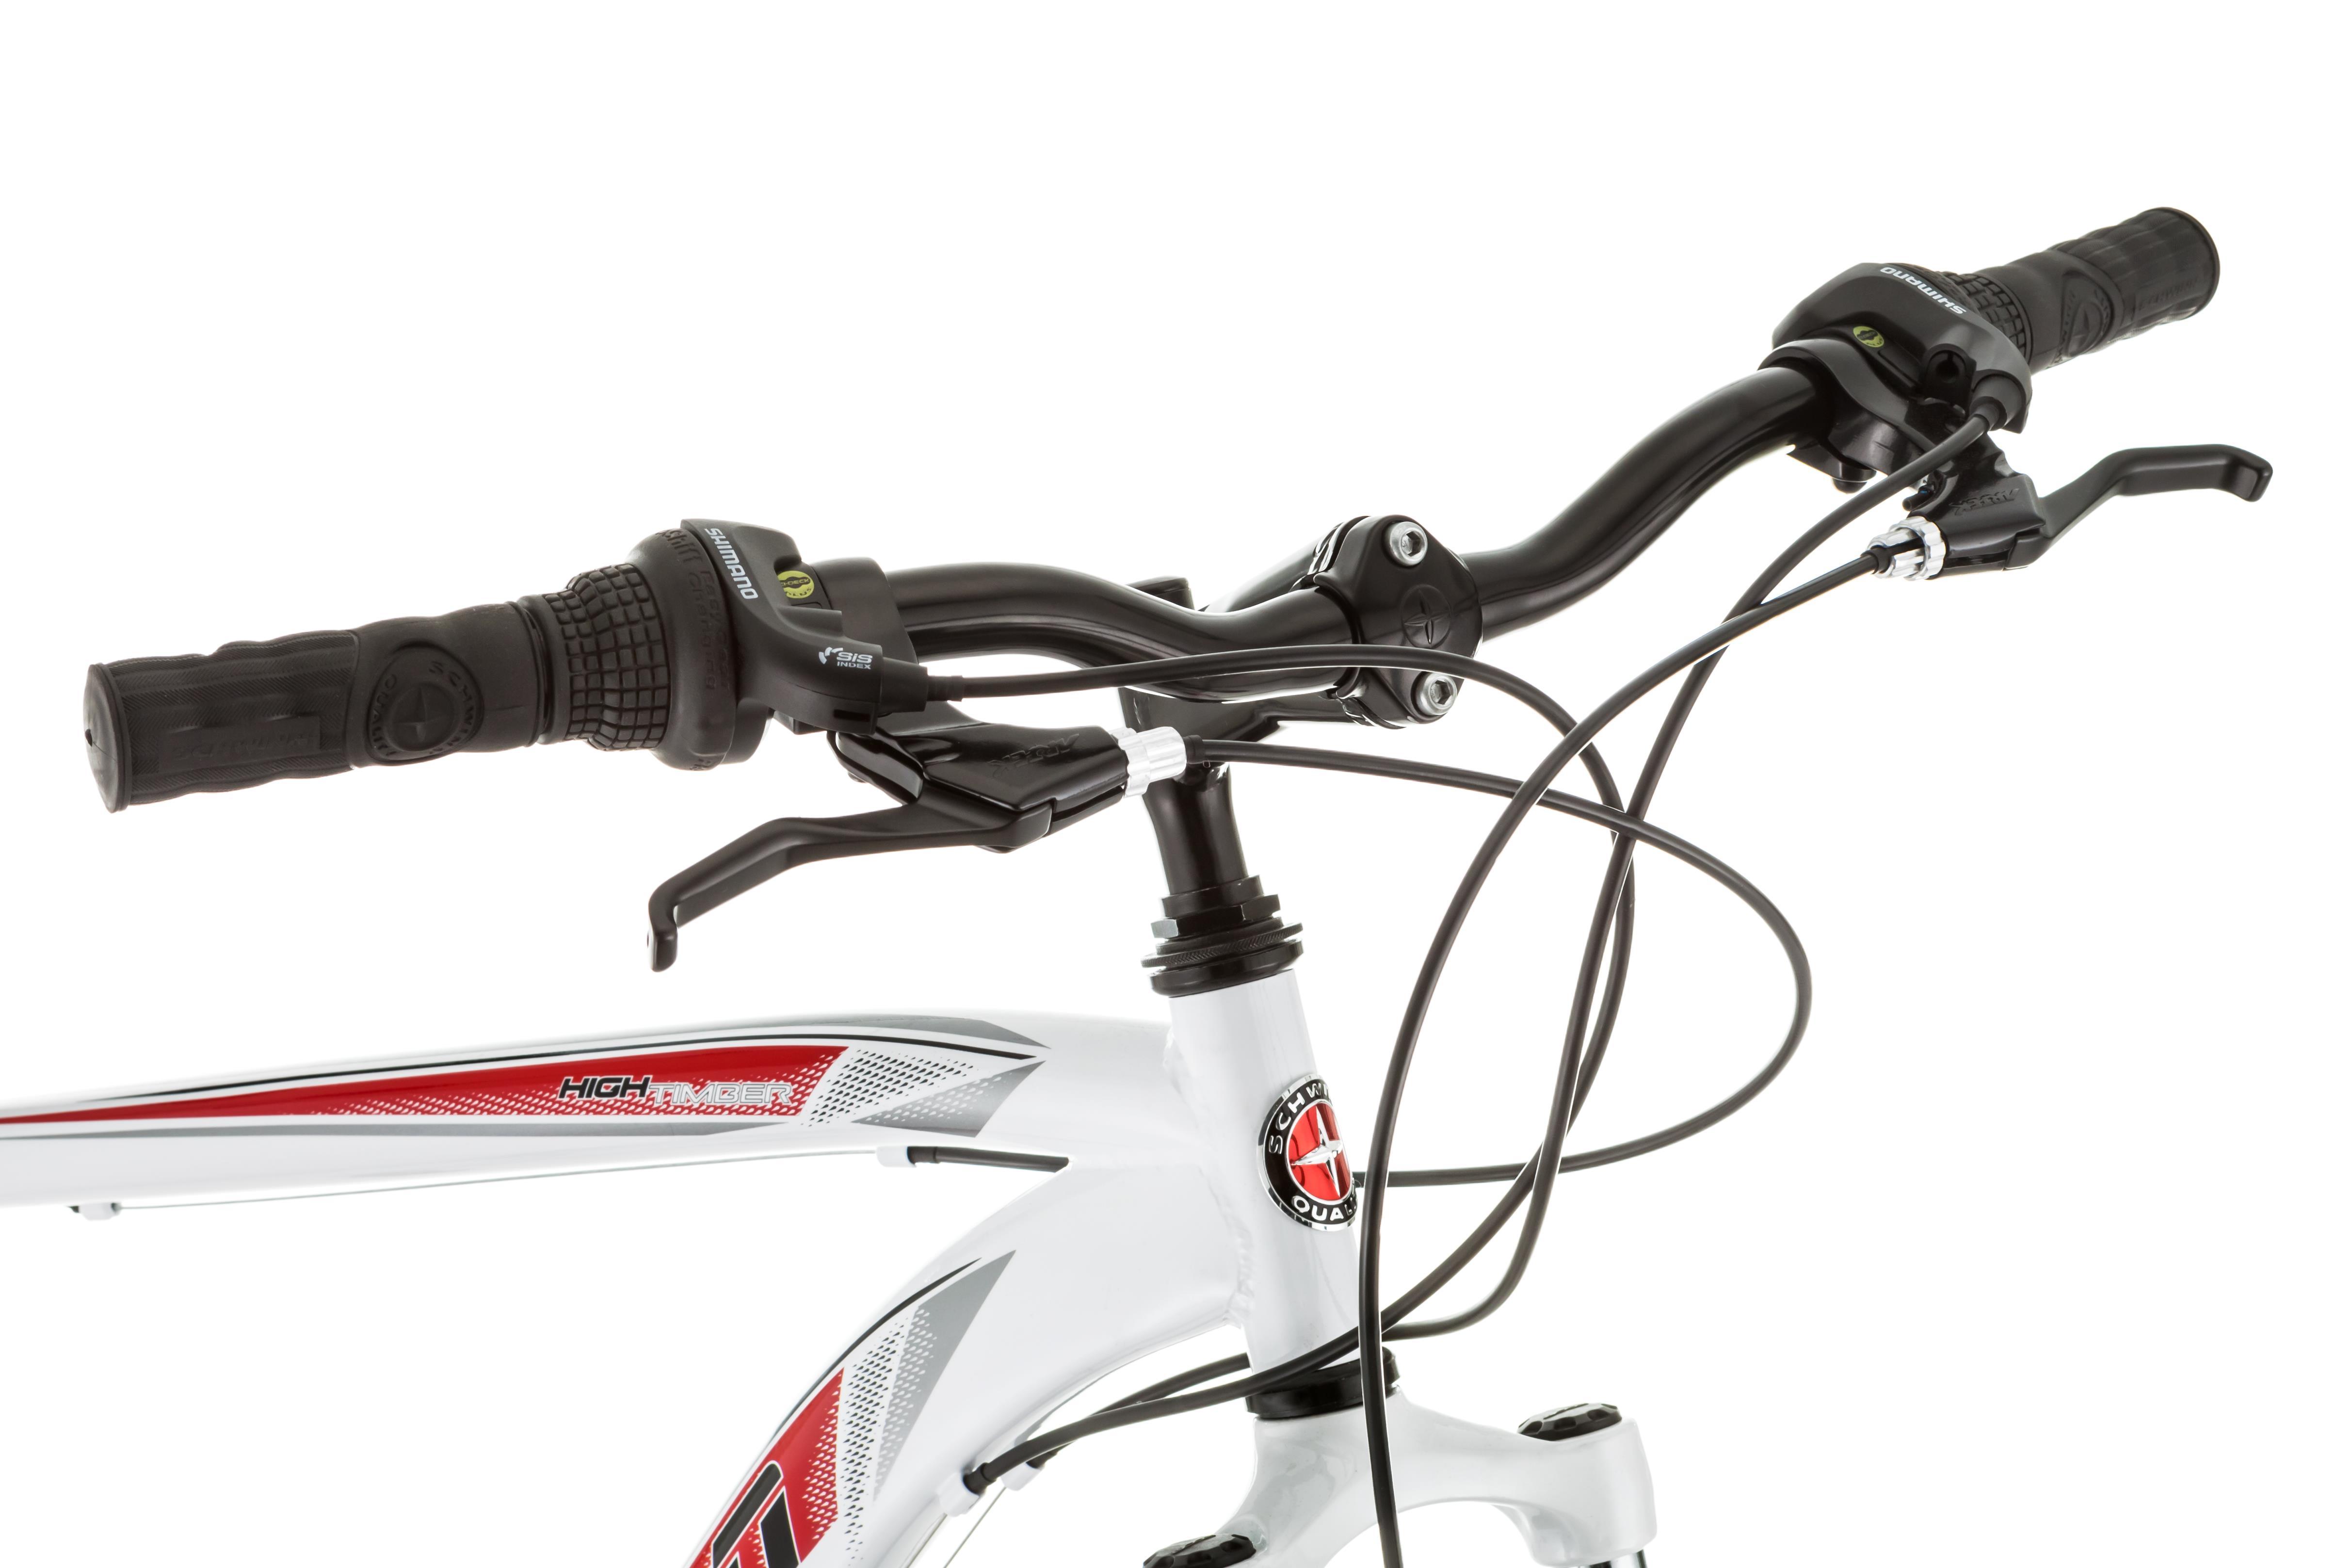 Schwinn High Timber Replacement Parts : Schwinn s a men high timber front suspension bicycle